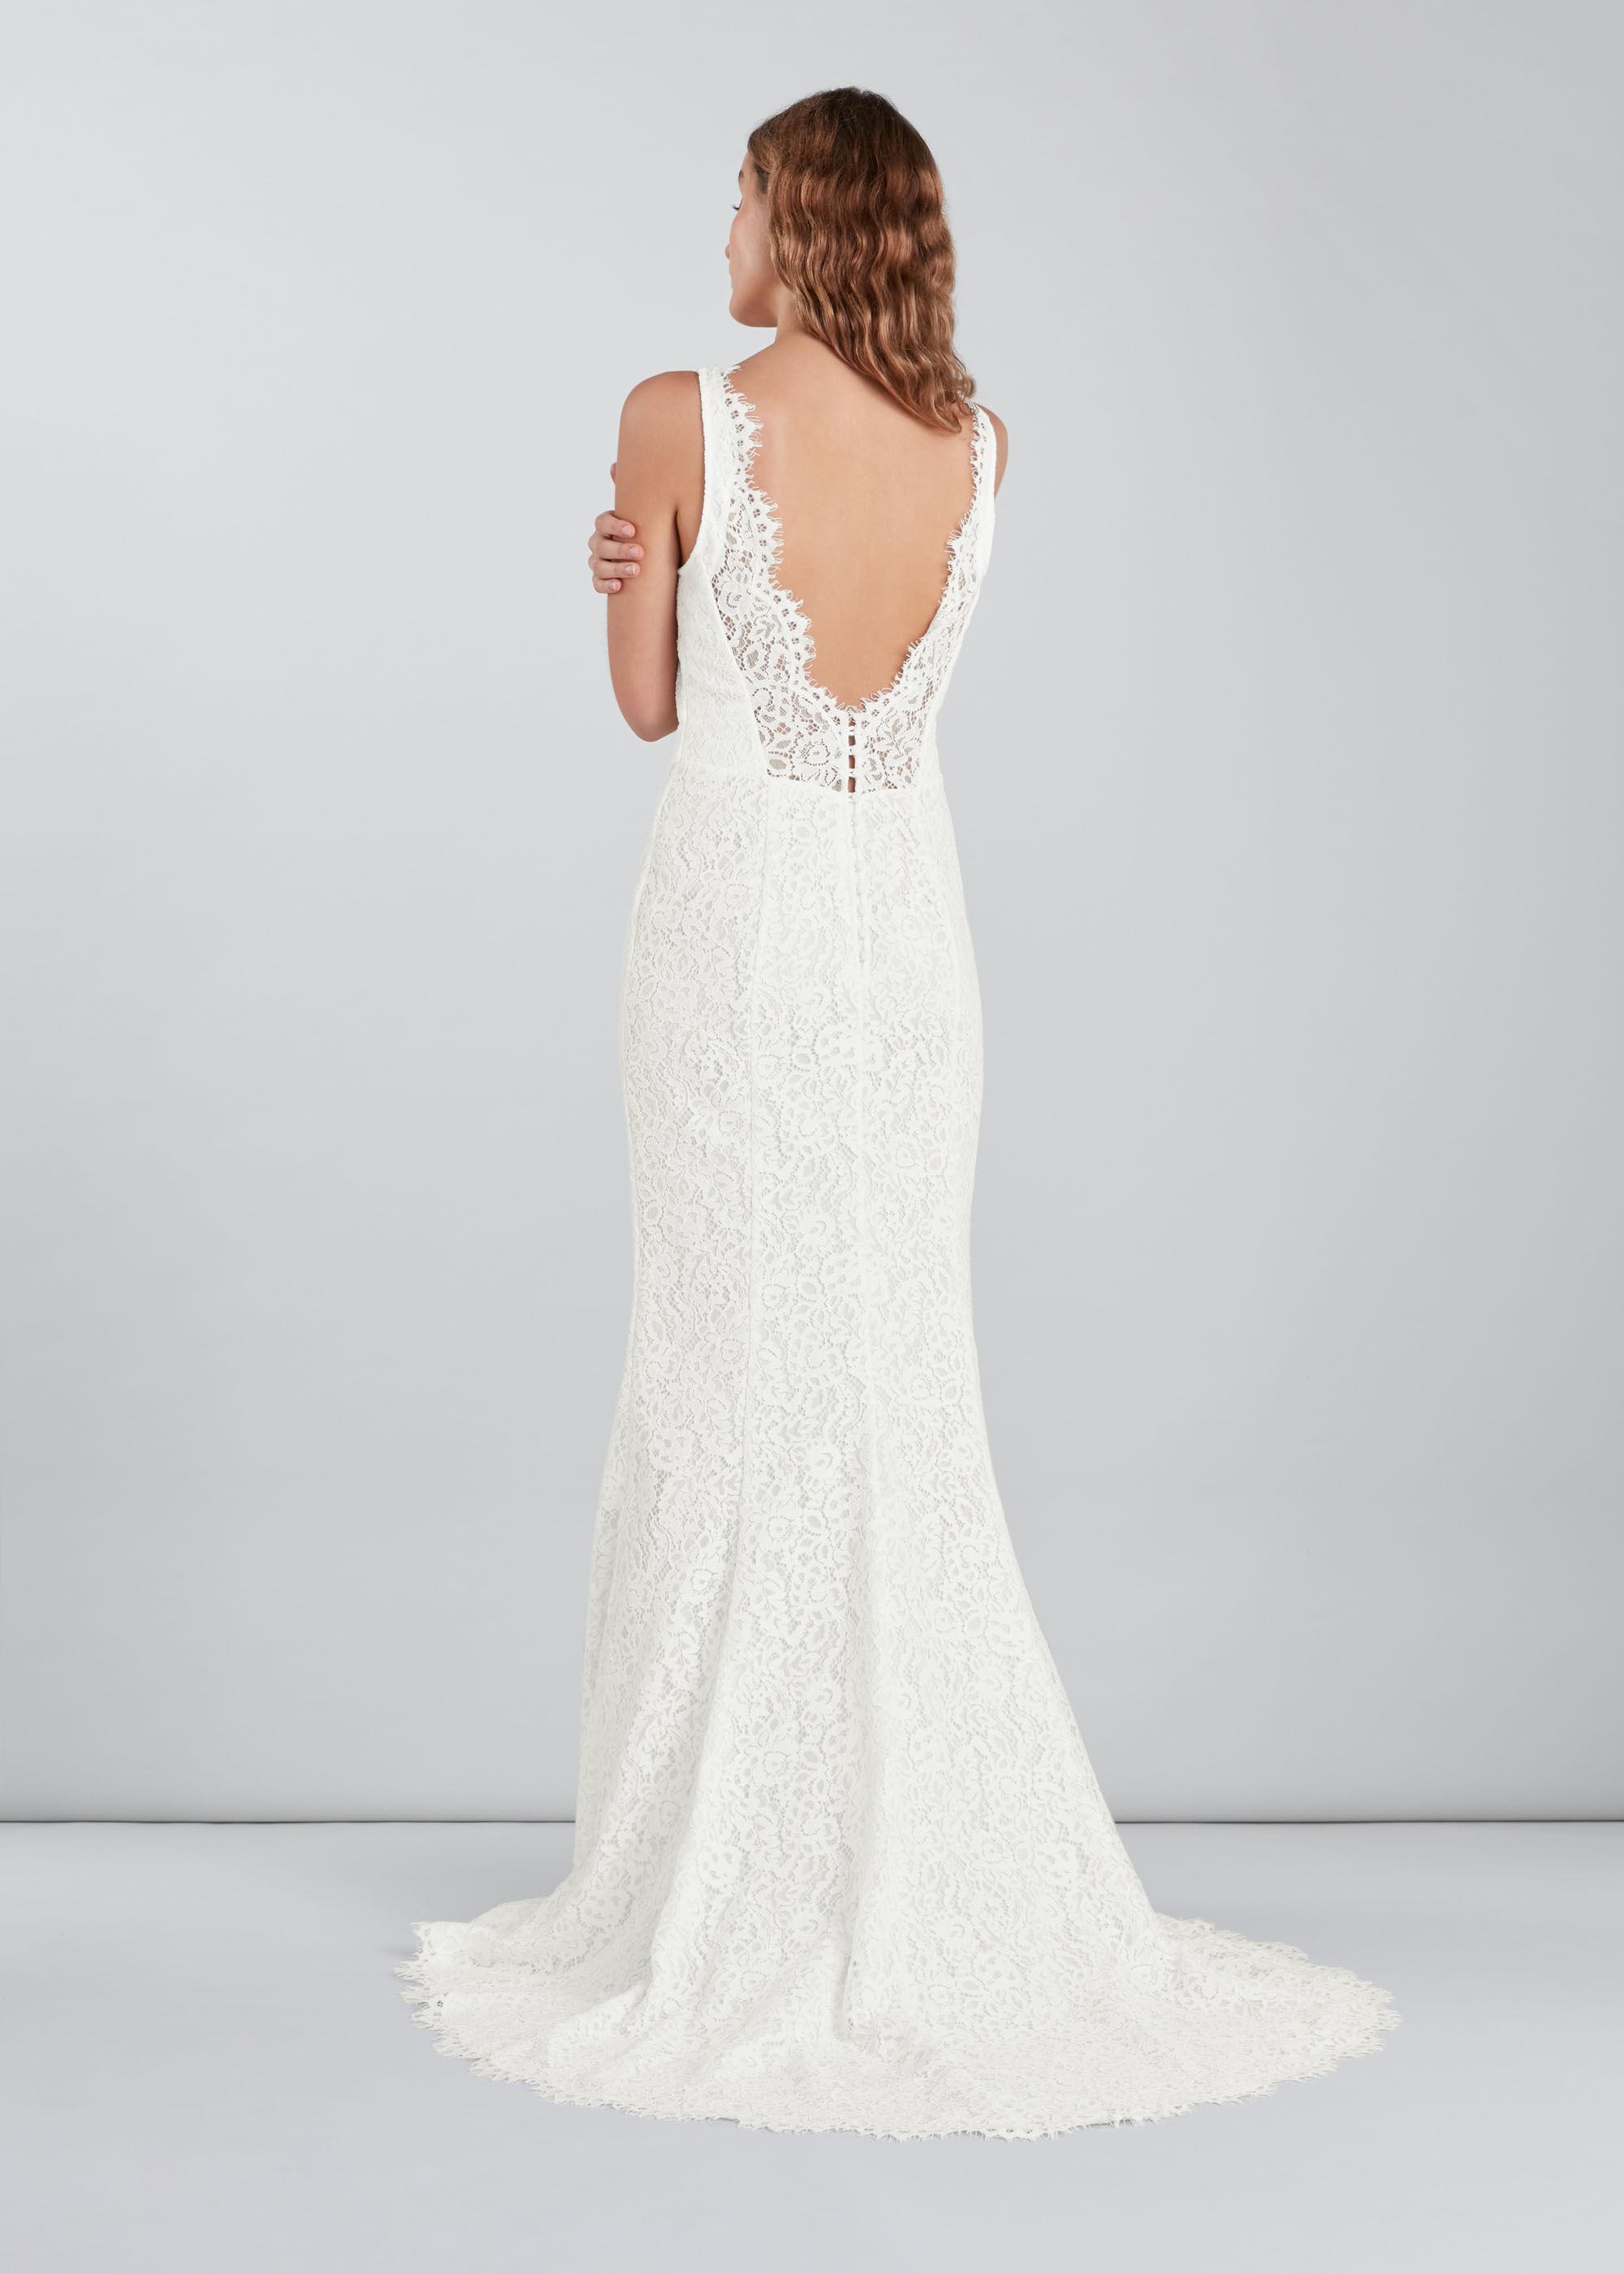 Gray Lace Bridesmaid Dress ,lacy wedding dress,Gray Lace Bridesmaid Dress,Lace Fluted Wedding Dress,lace wedding dress,lace wedding dress,lace wedding dress,lace wedding dress,